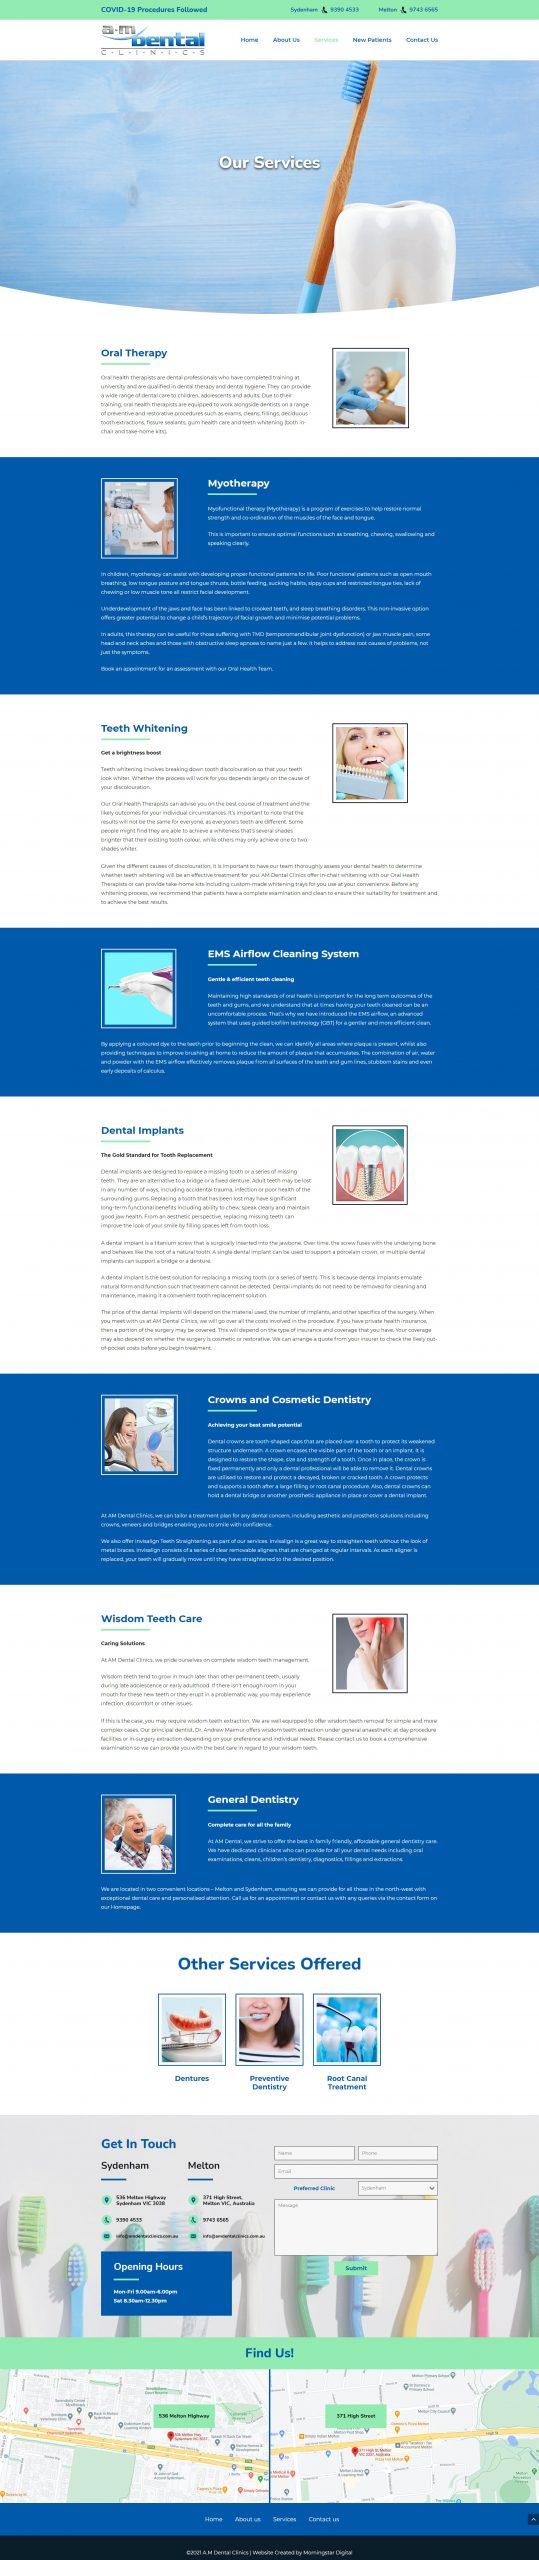 AMDental Services